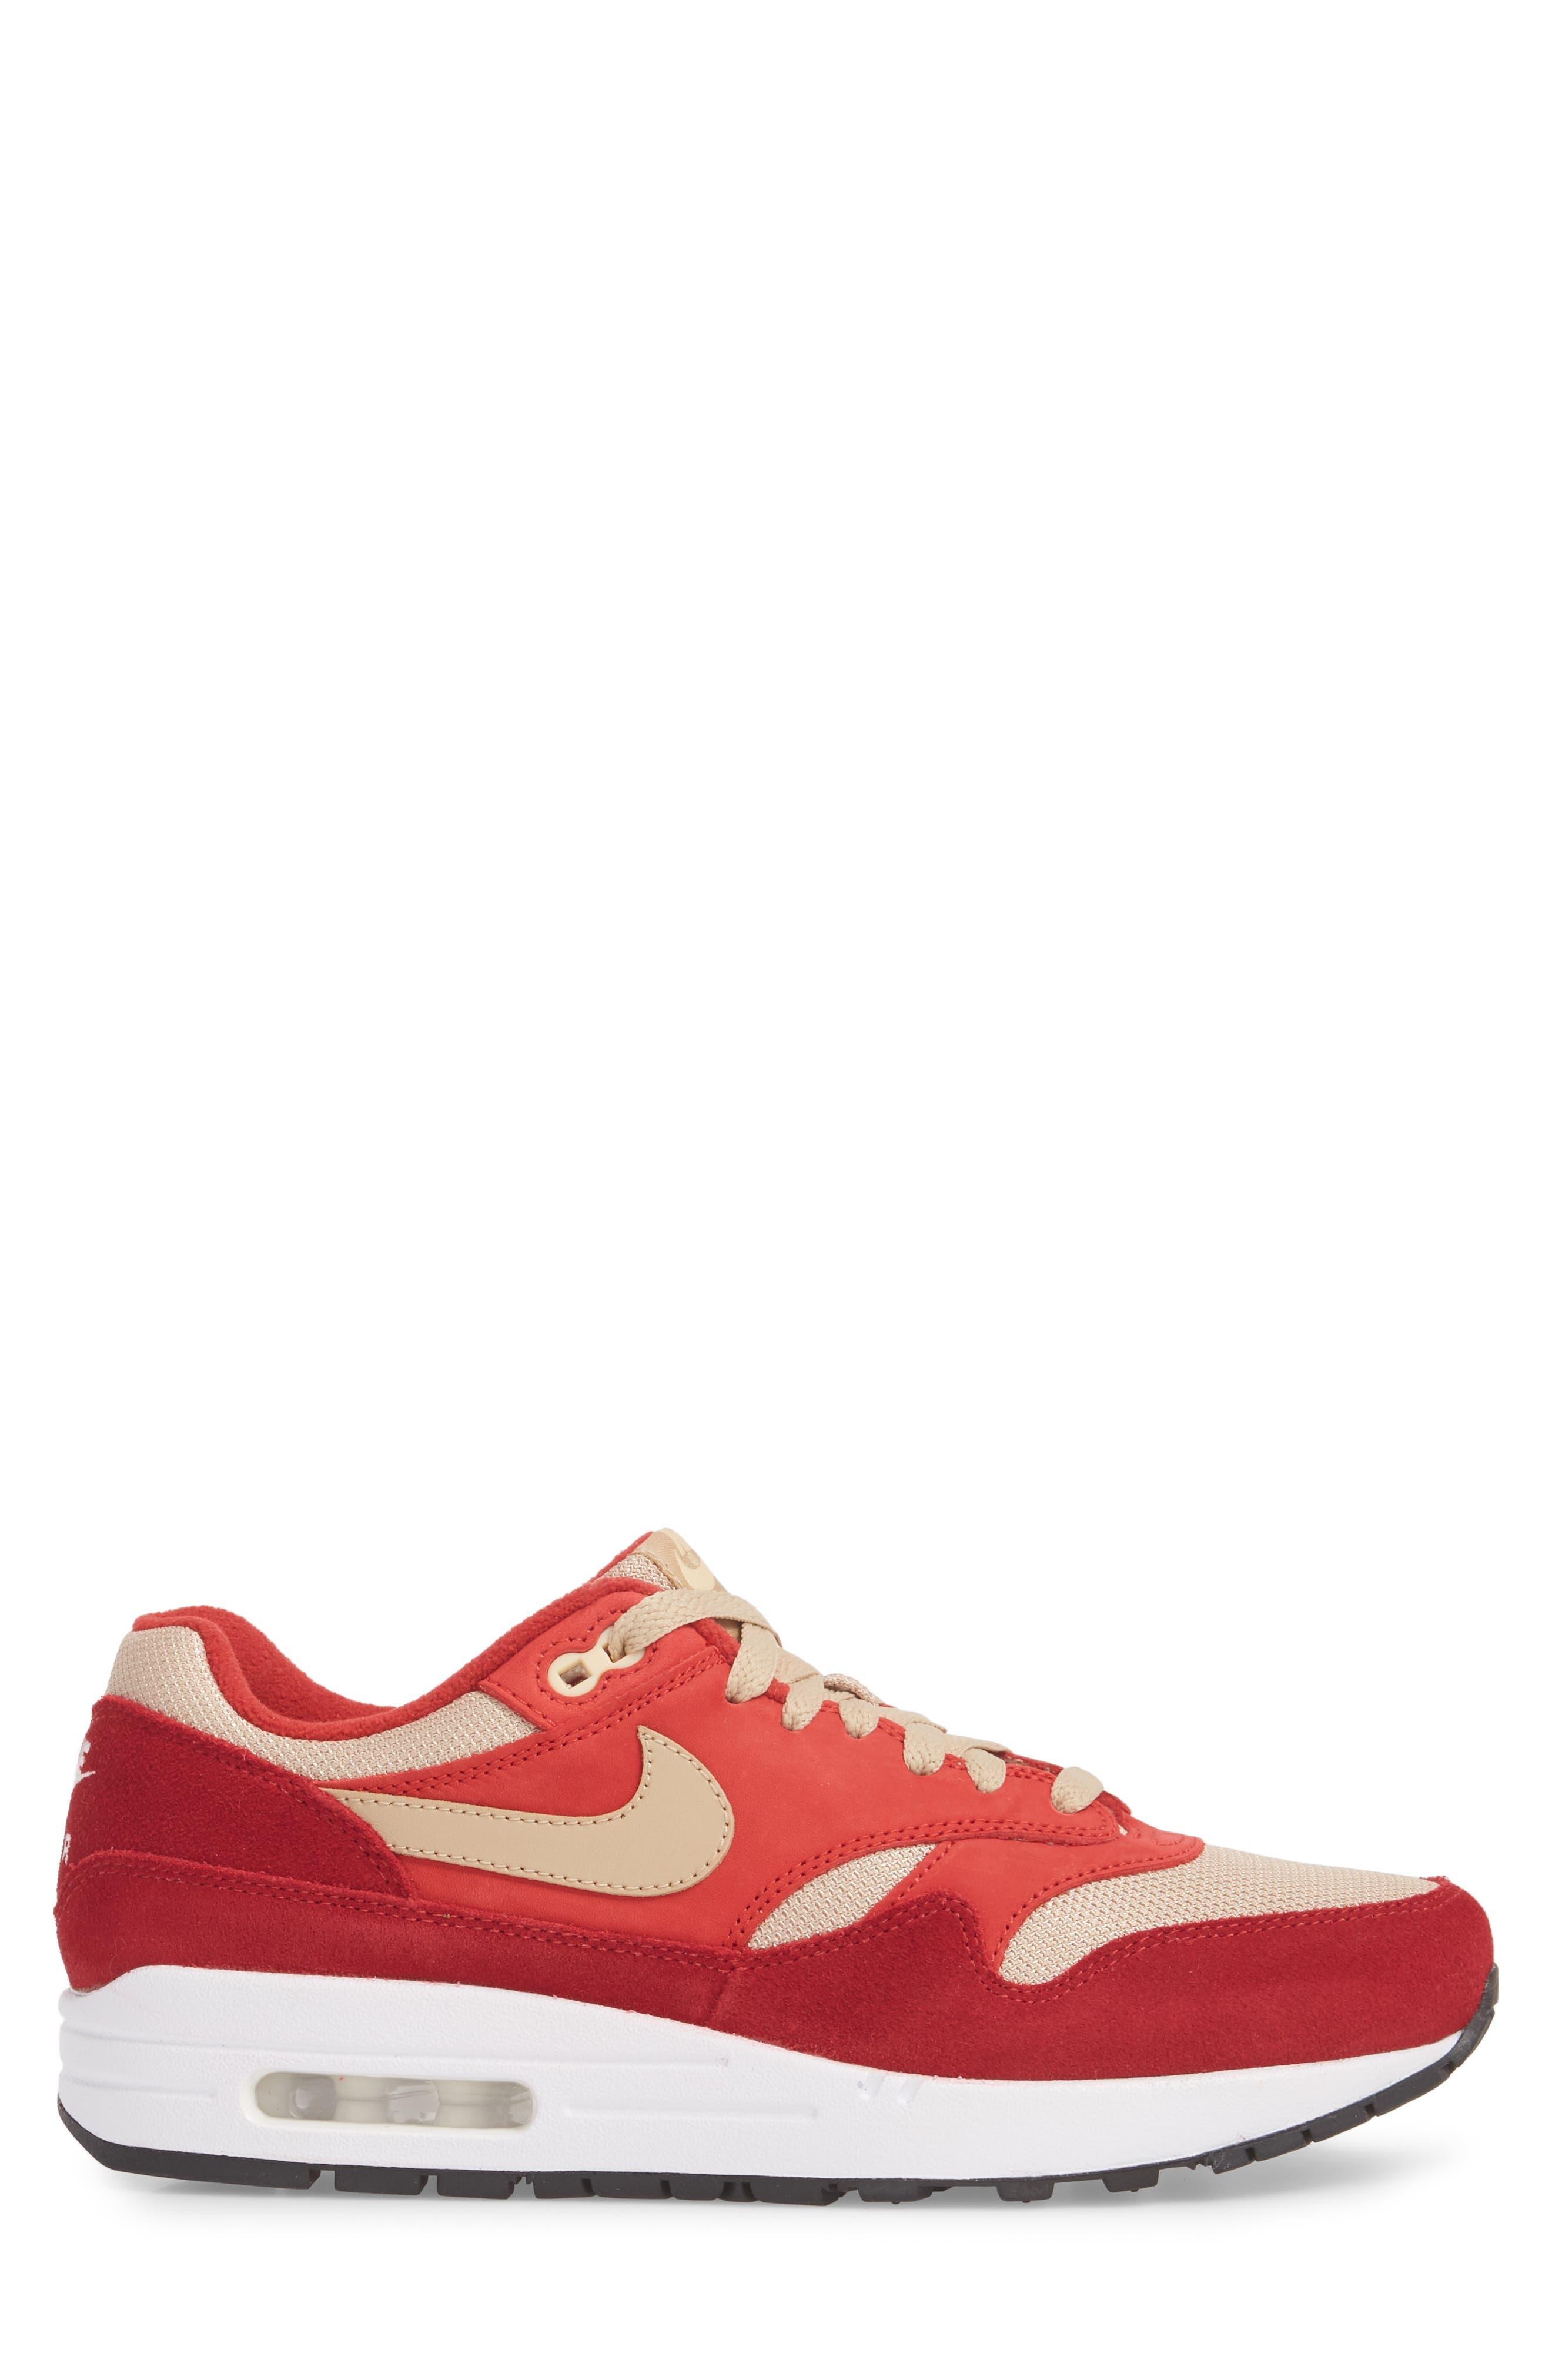 Air Max 1 Premium Retro Sneaker,                             Alternate thumbnail 3, color,                             Red/ Mushroom-Red-Vanilla